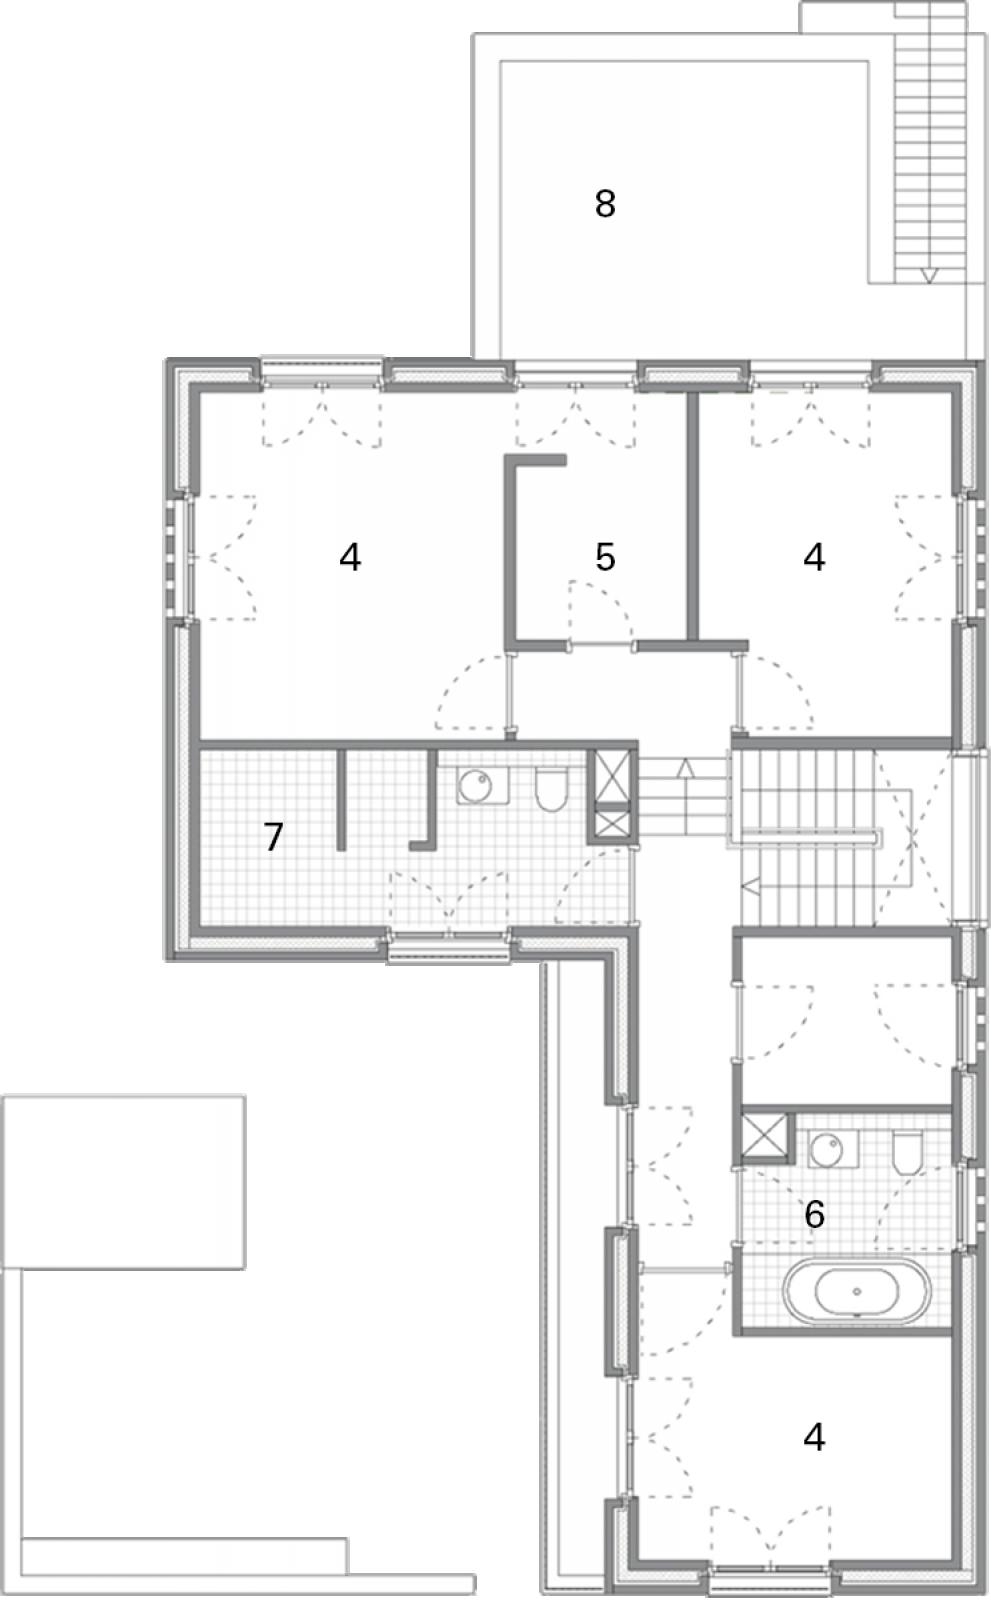 Nesselande Drawing Plan 0